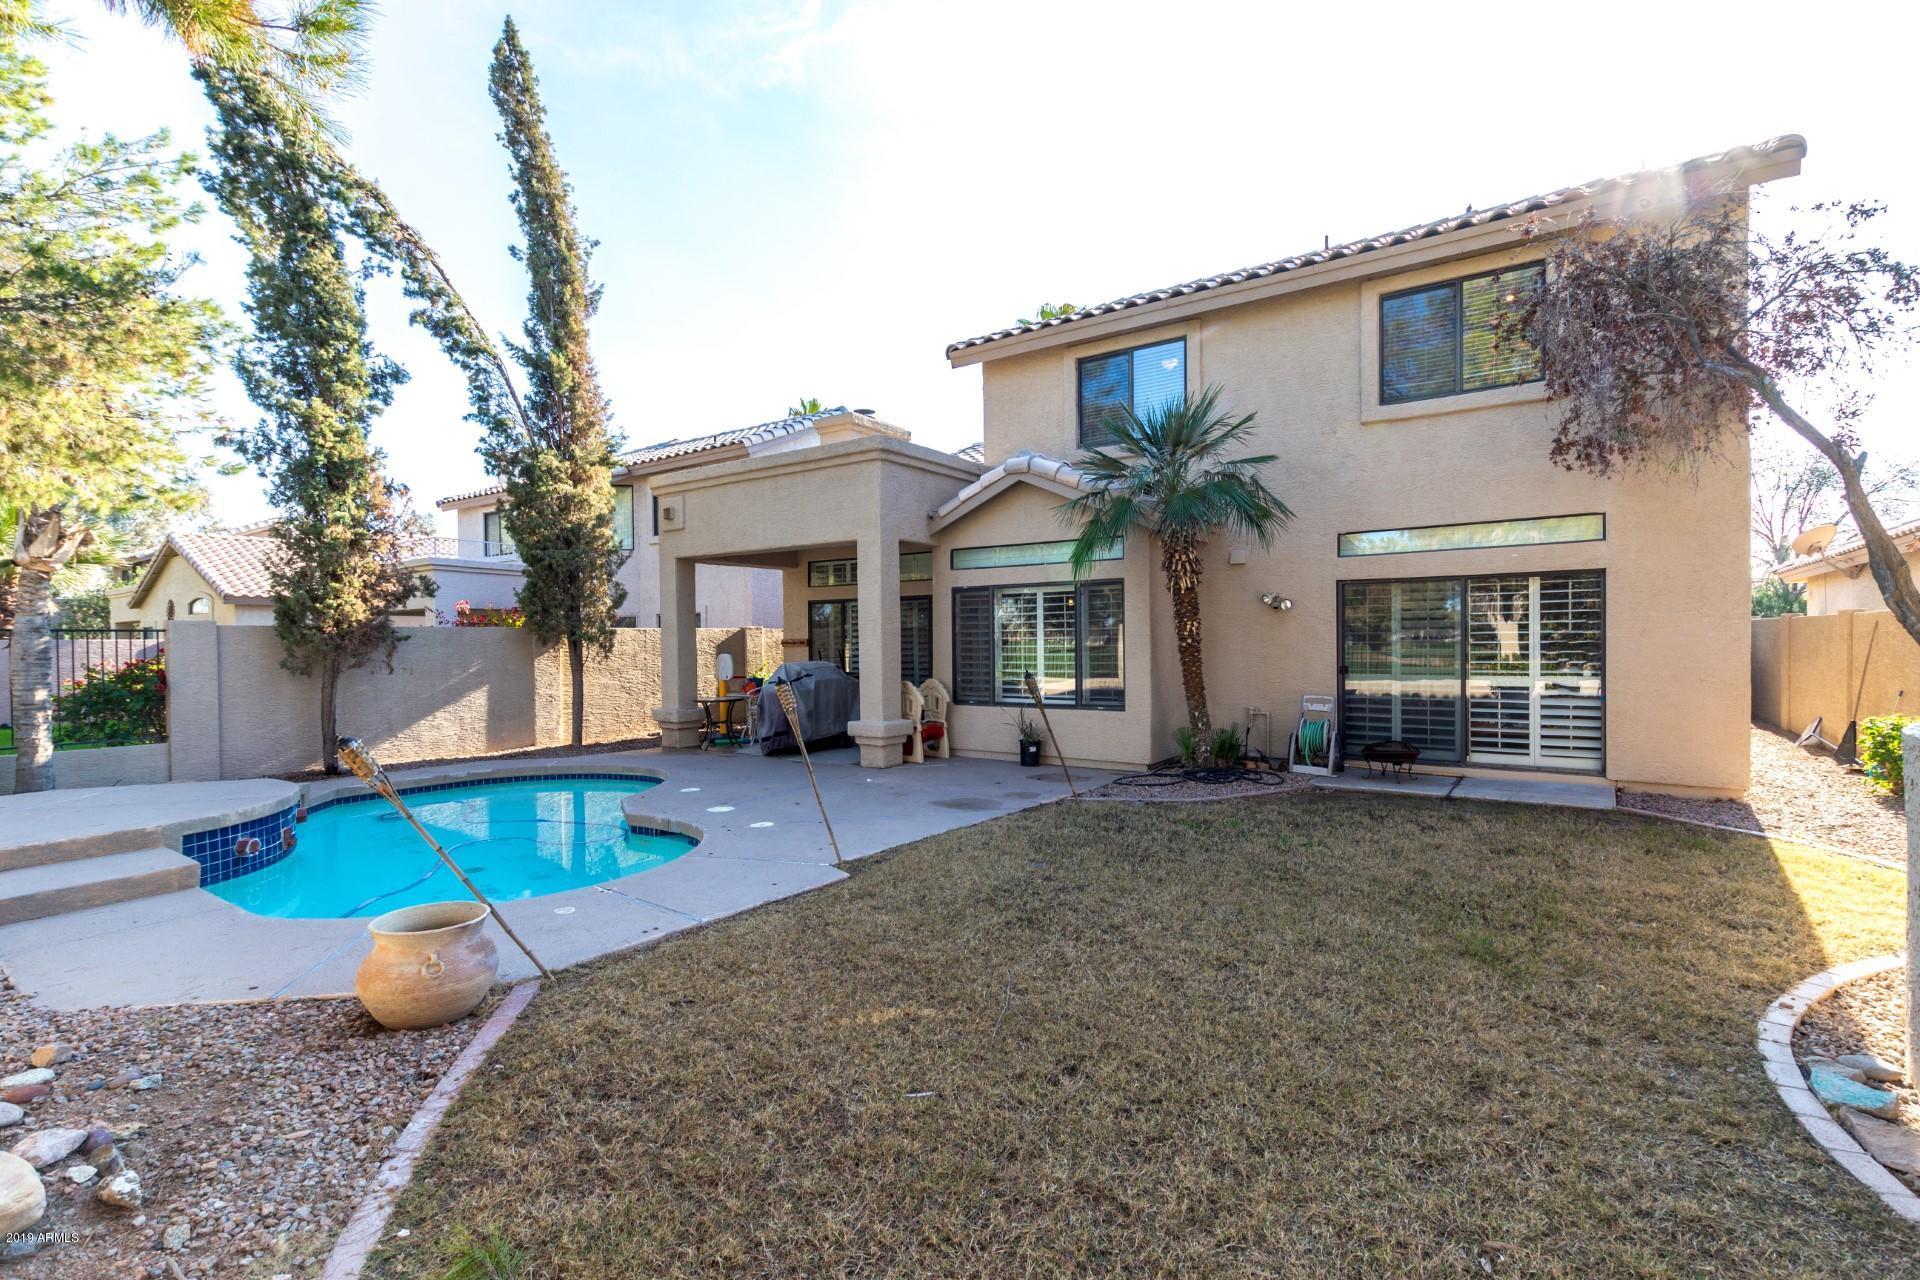 MLS 5873022 2132 W MYRTLE Drive, Chandler, AZ 85248 Chandler AZ Ocotillo